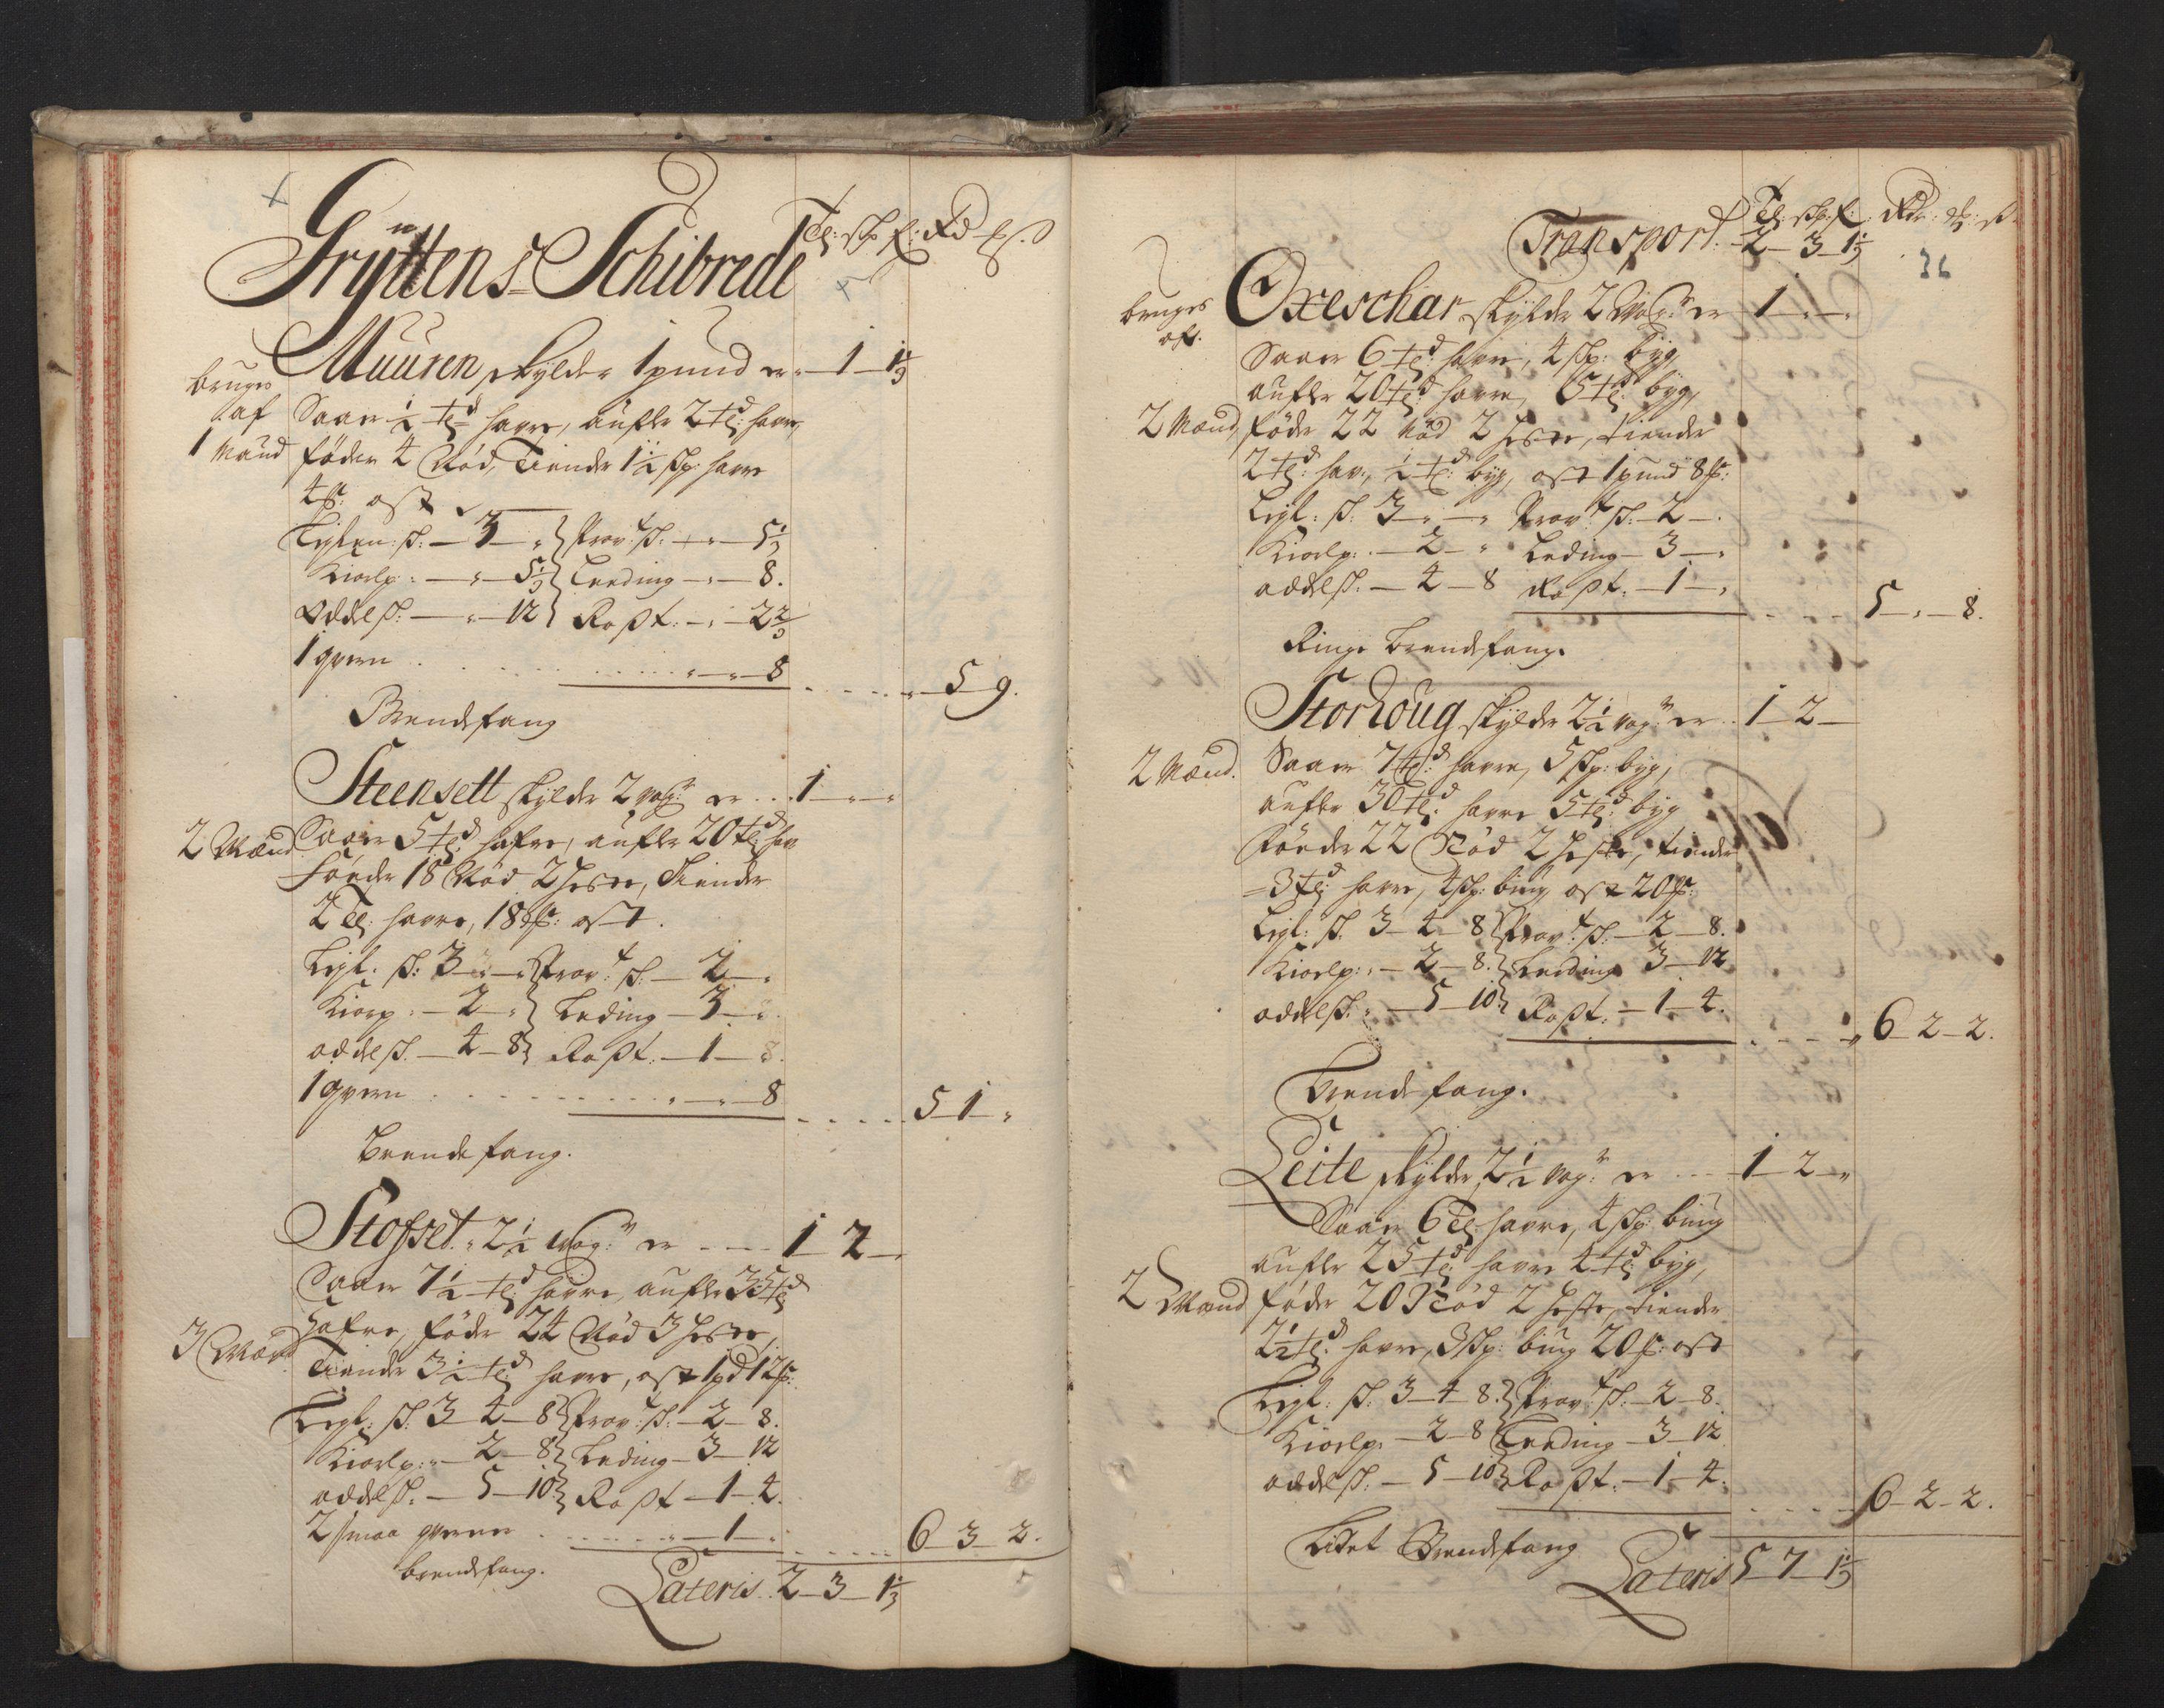 RA, Rentekammeret inntil 1814, Realistisk ordnet avdeling, N/Nb/Nbf/L0148: Sunnmøre, prøvematrikkel, 1714, s. 35b-36a